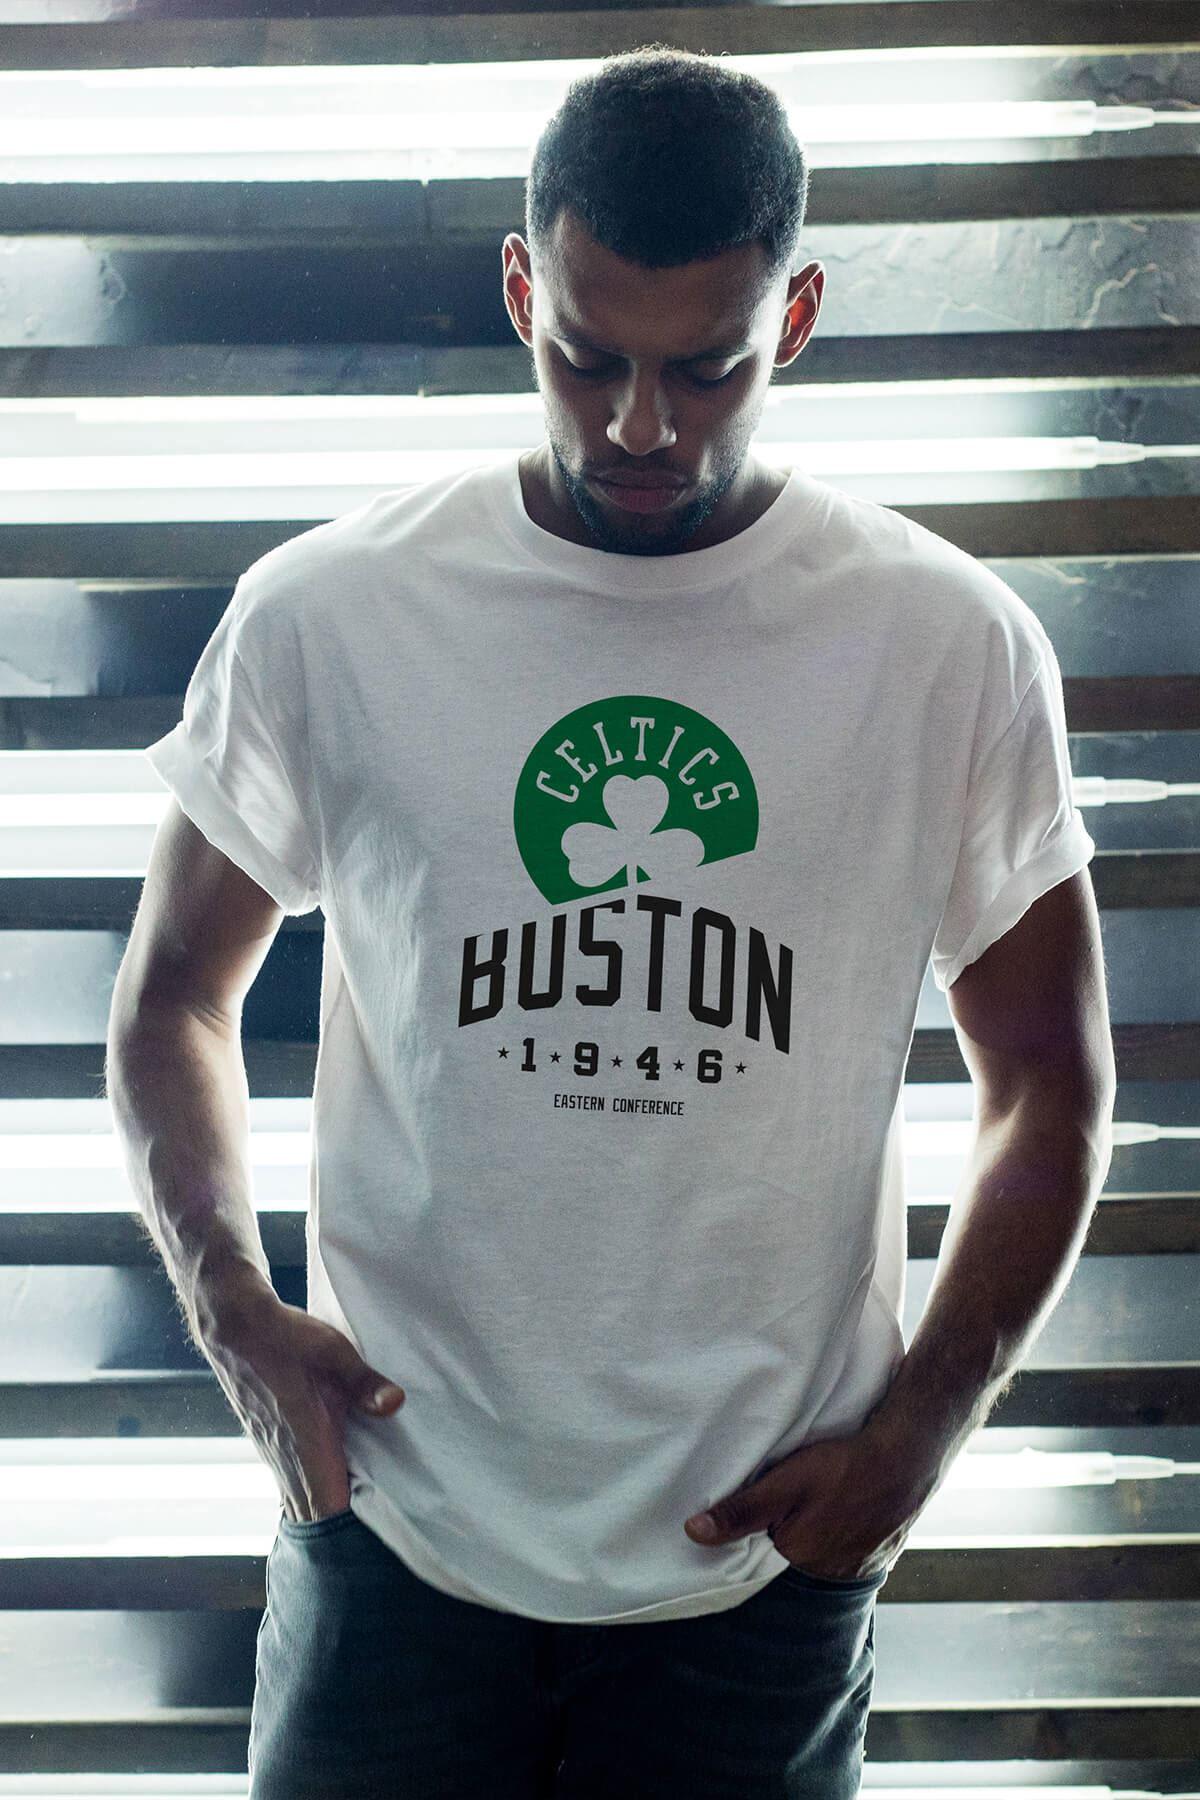 Boston Celtics 24 Beyaz Erkek Oversize Tshirt - Tişört